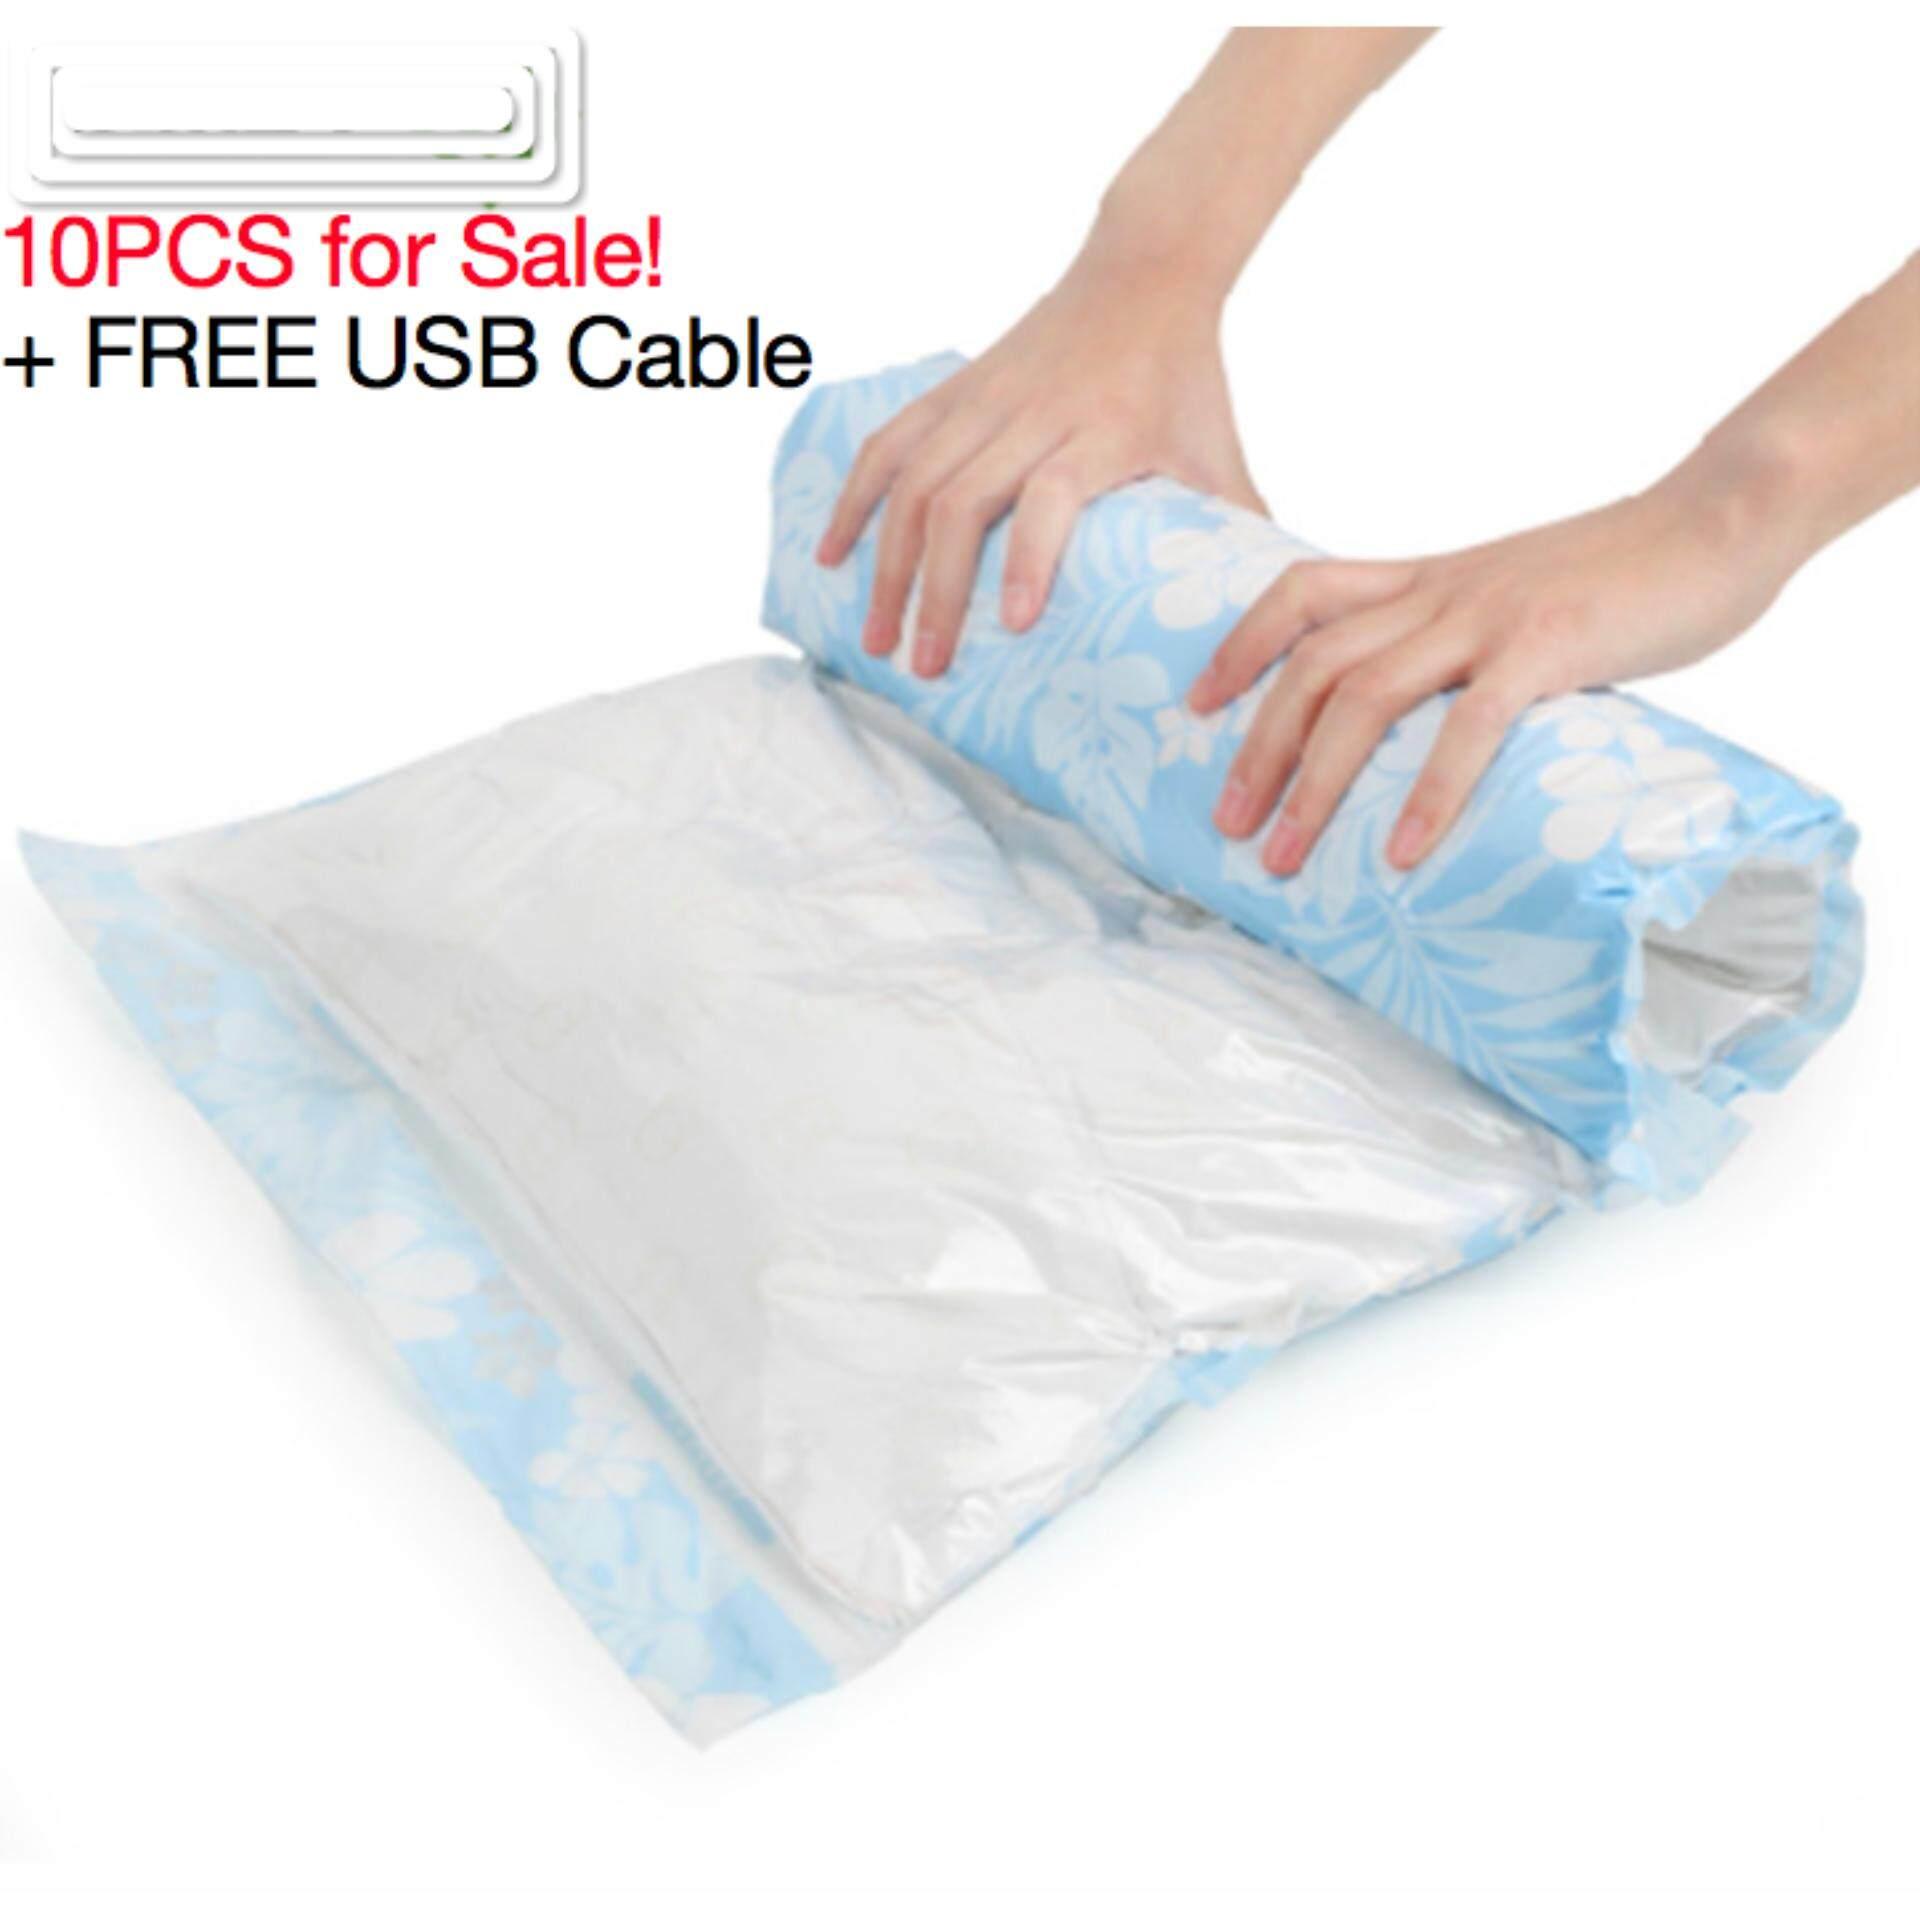 Compression Bag For Sale Sack Online Brands Prices Hand Rolling Compressed Set Of 10 Handroll Vacuum Storage Bags Blue Intl